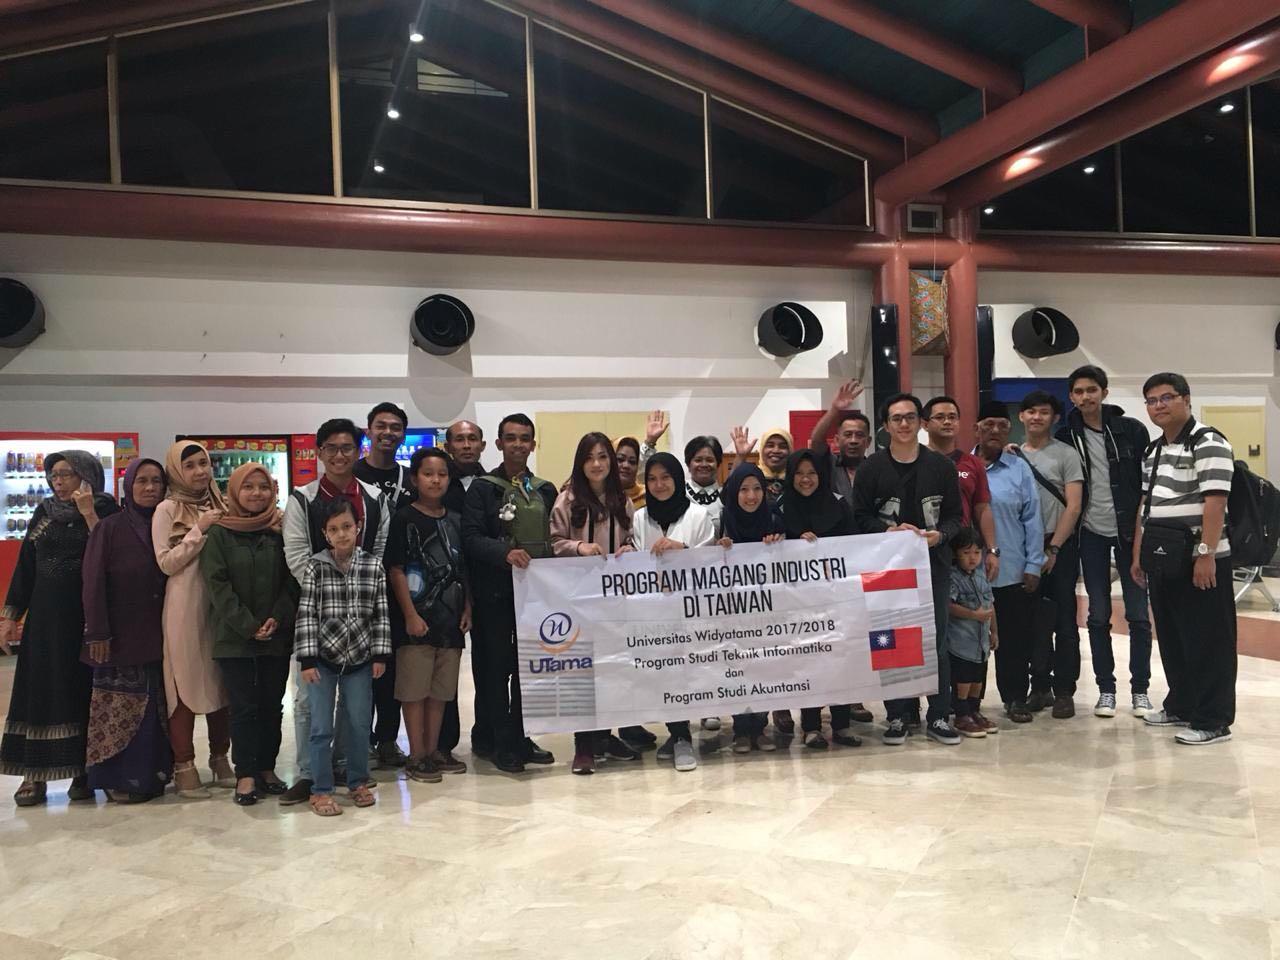 Kloter 2 - Widyatama大学的20多名学生在台湾参加了留学和实习计划